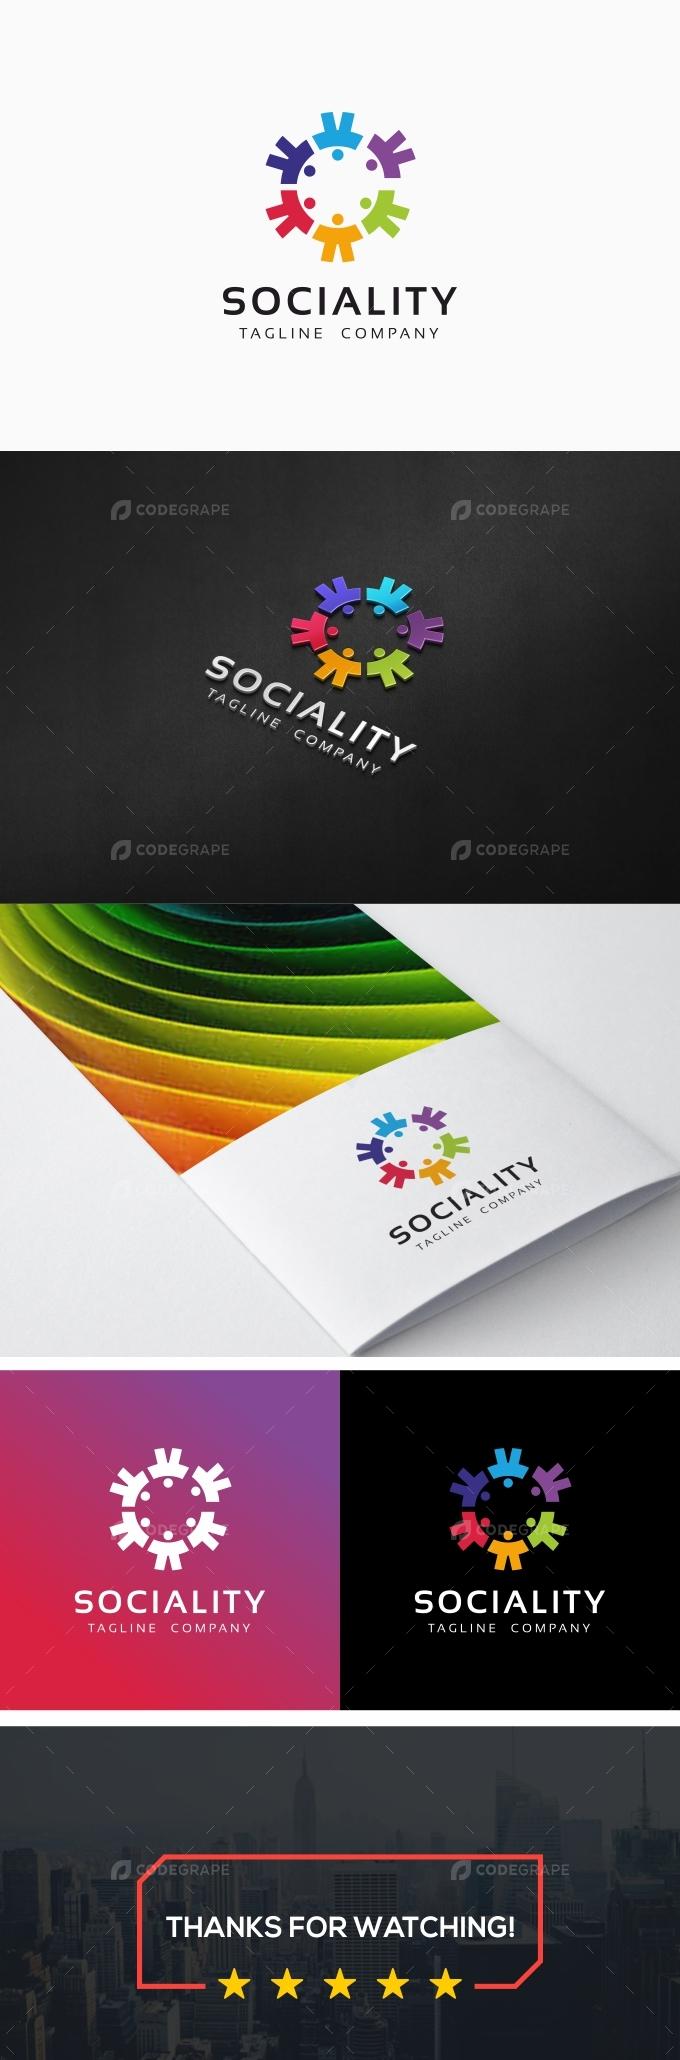 Sociality - Human Social Logo